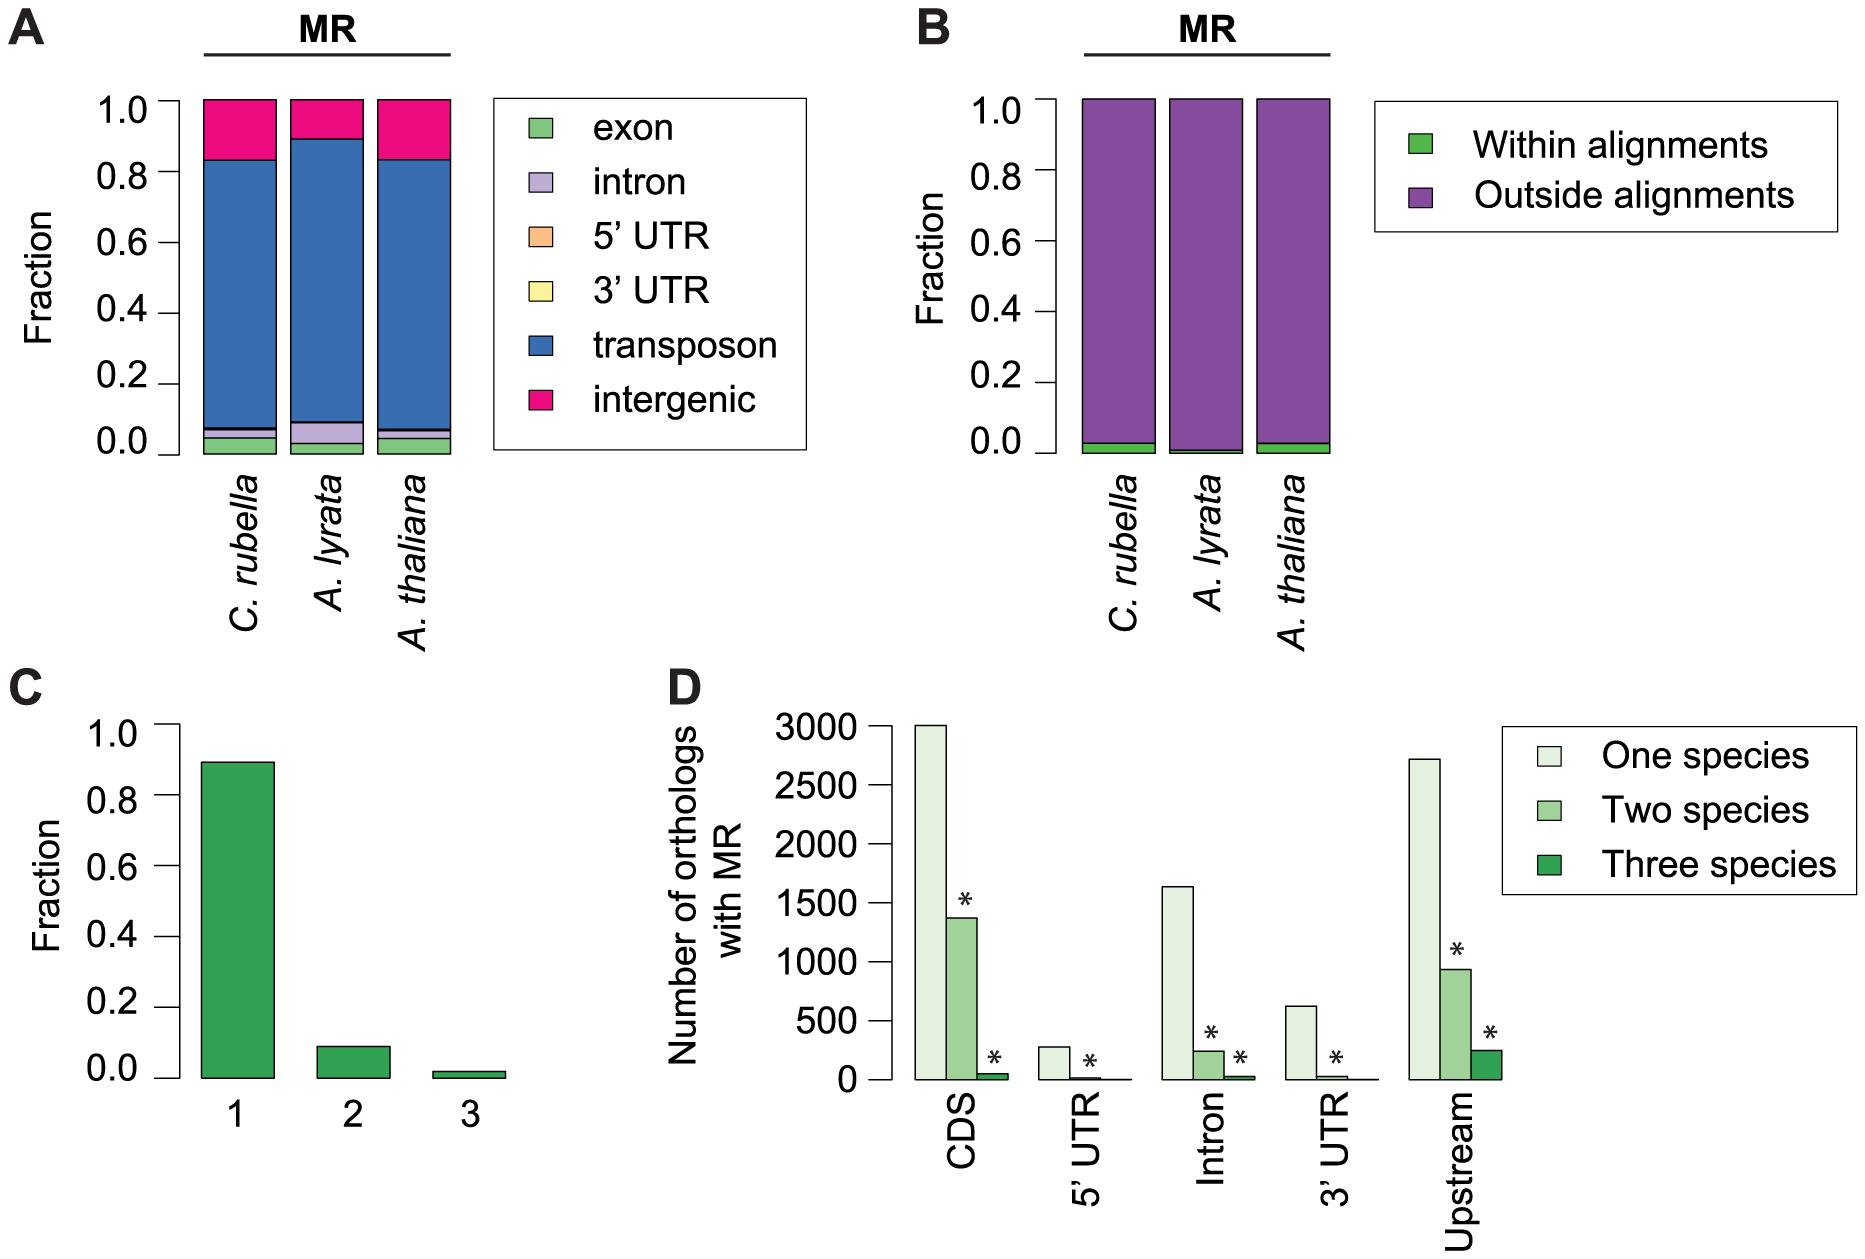 Conservation of methylated regions (MR).